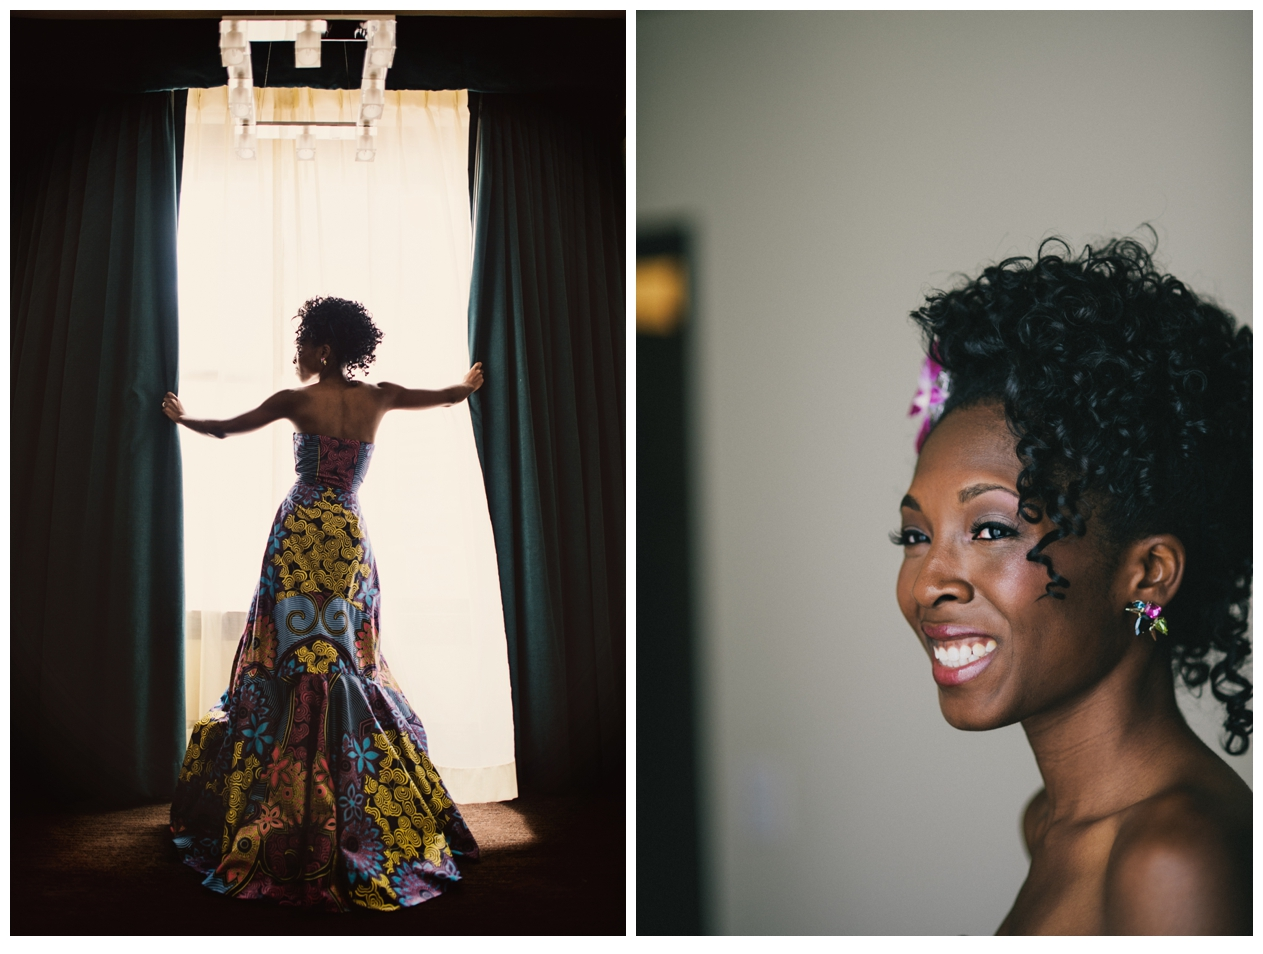 002-AmandaKoppImages-Denver-Wedding-Photo.jpg